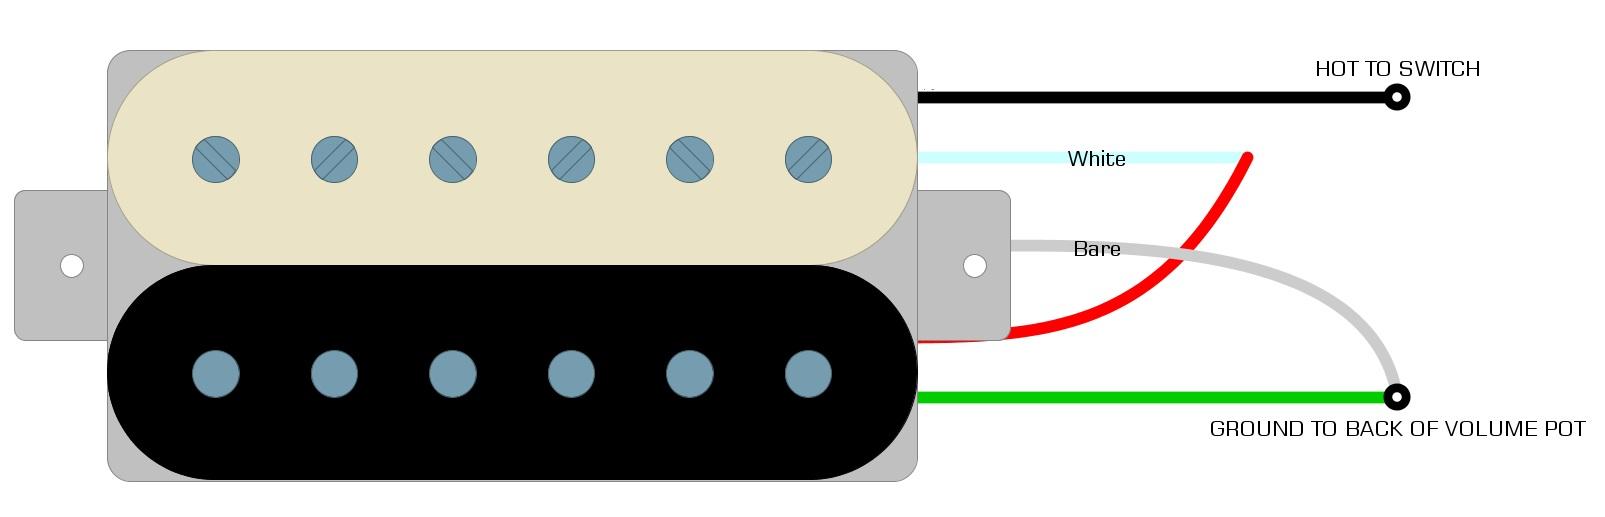 [WLLP_2054]   Railhammer Hyper Vintage Wiring Diagram | Humbucker Soup | Vintage Rails Wiring Diagram |  | Humbucker Soup